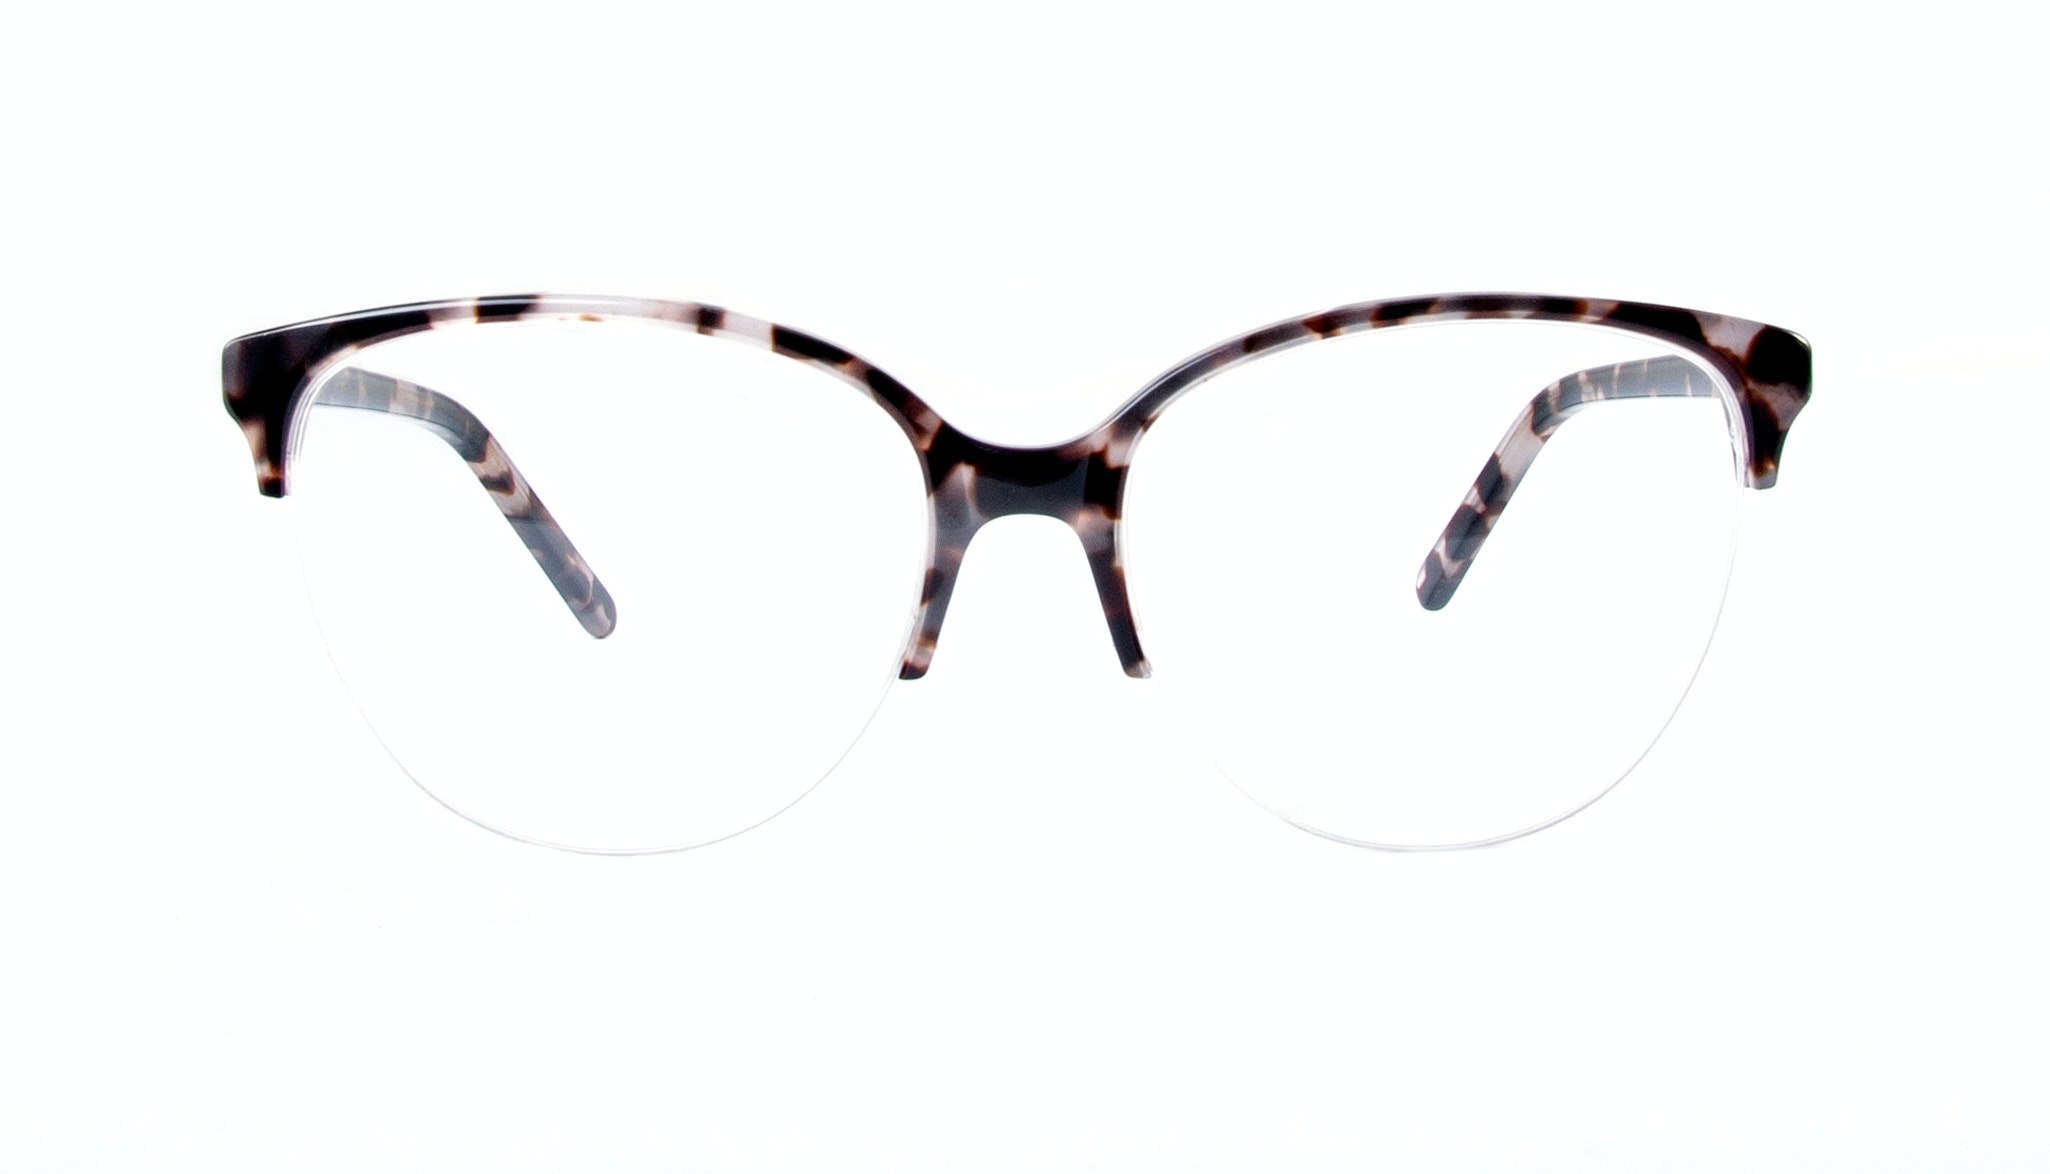 Affordable Fashion Glasses Cat Eye Round Semi-Rimless Eyeglasses Women Imagine Light Mocha Tortoise